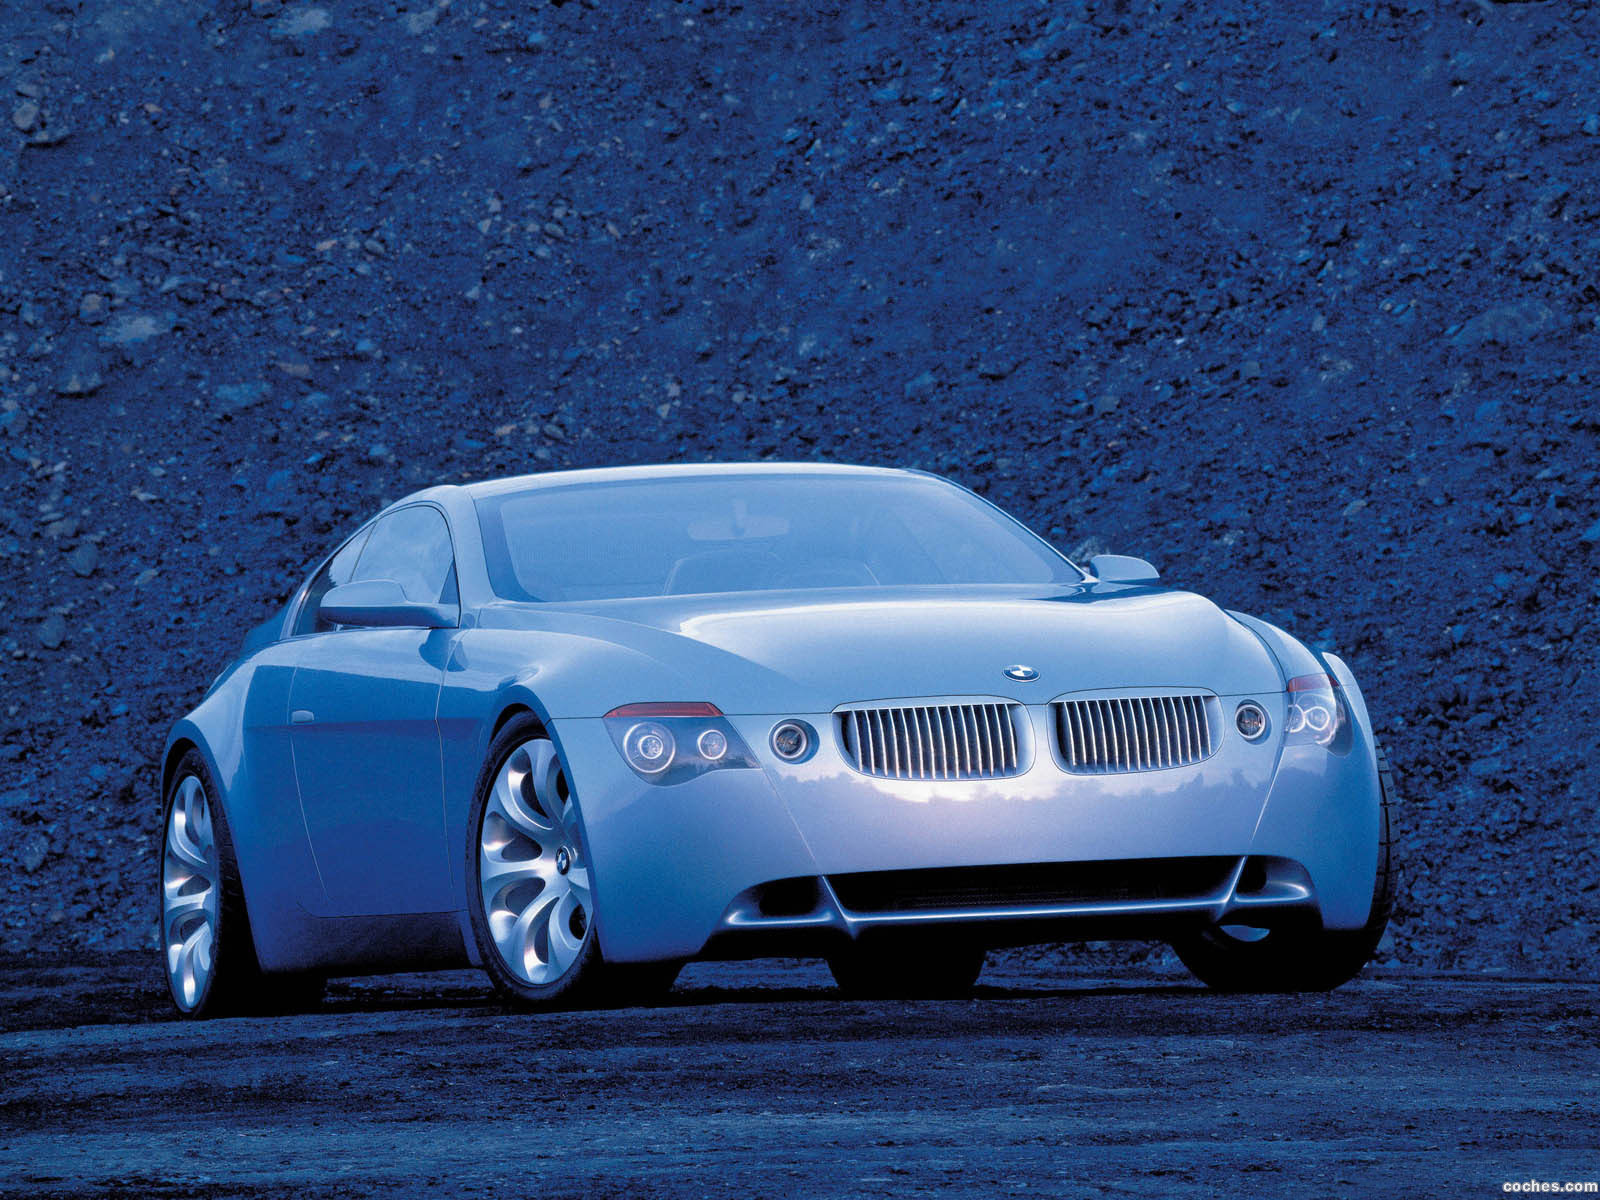 Foto 0 de BMW Z9 Gran Turismo Concept 1999